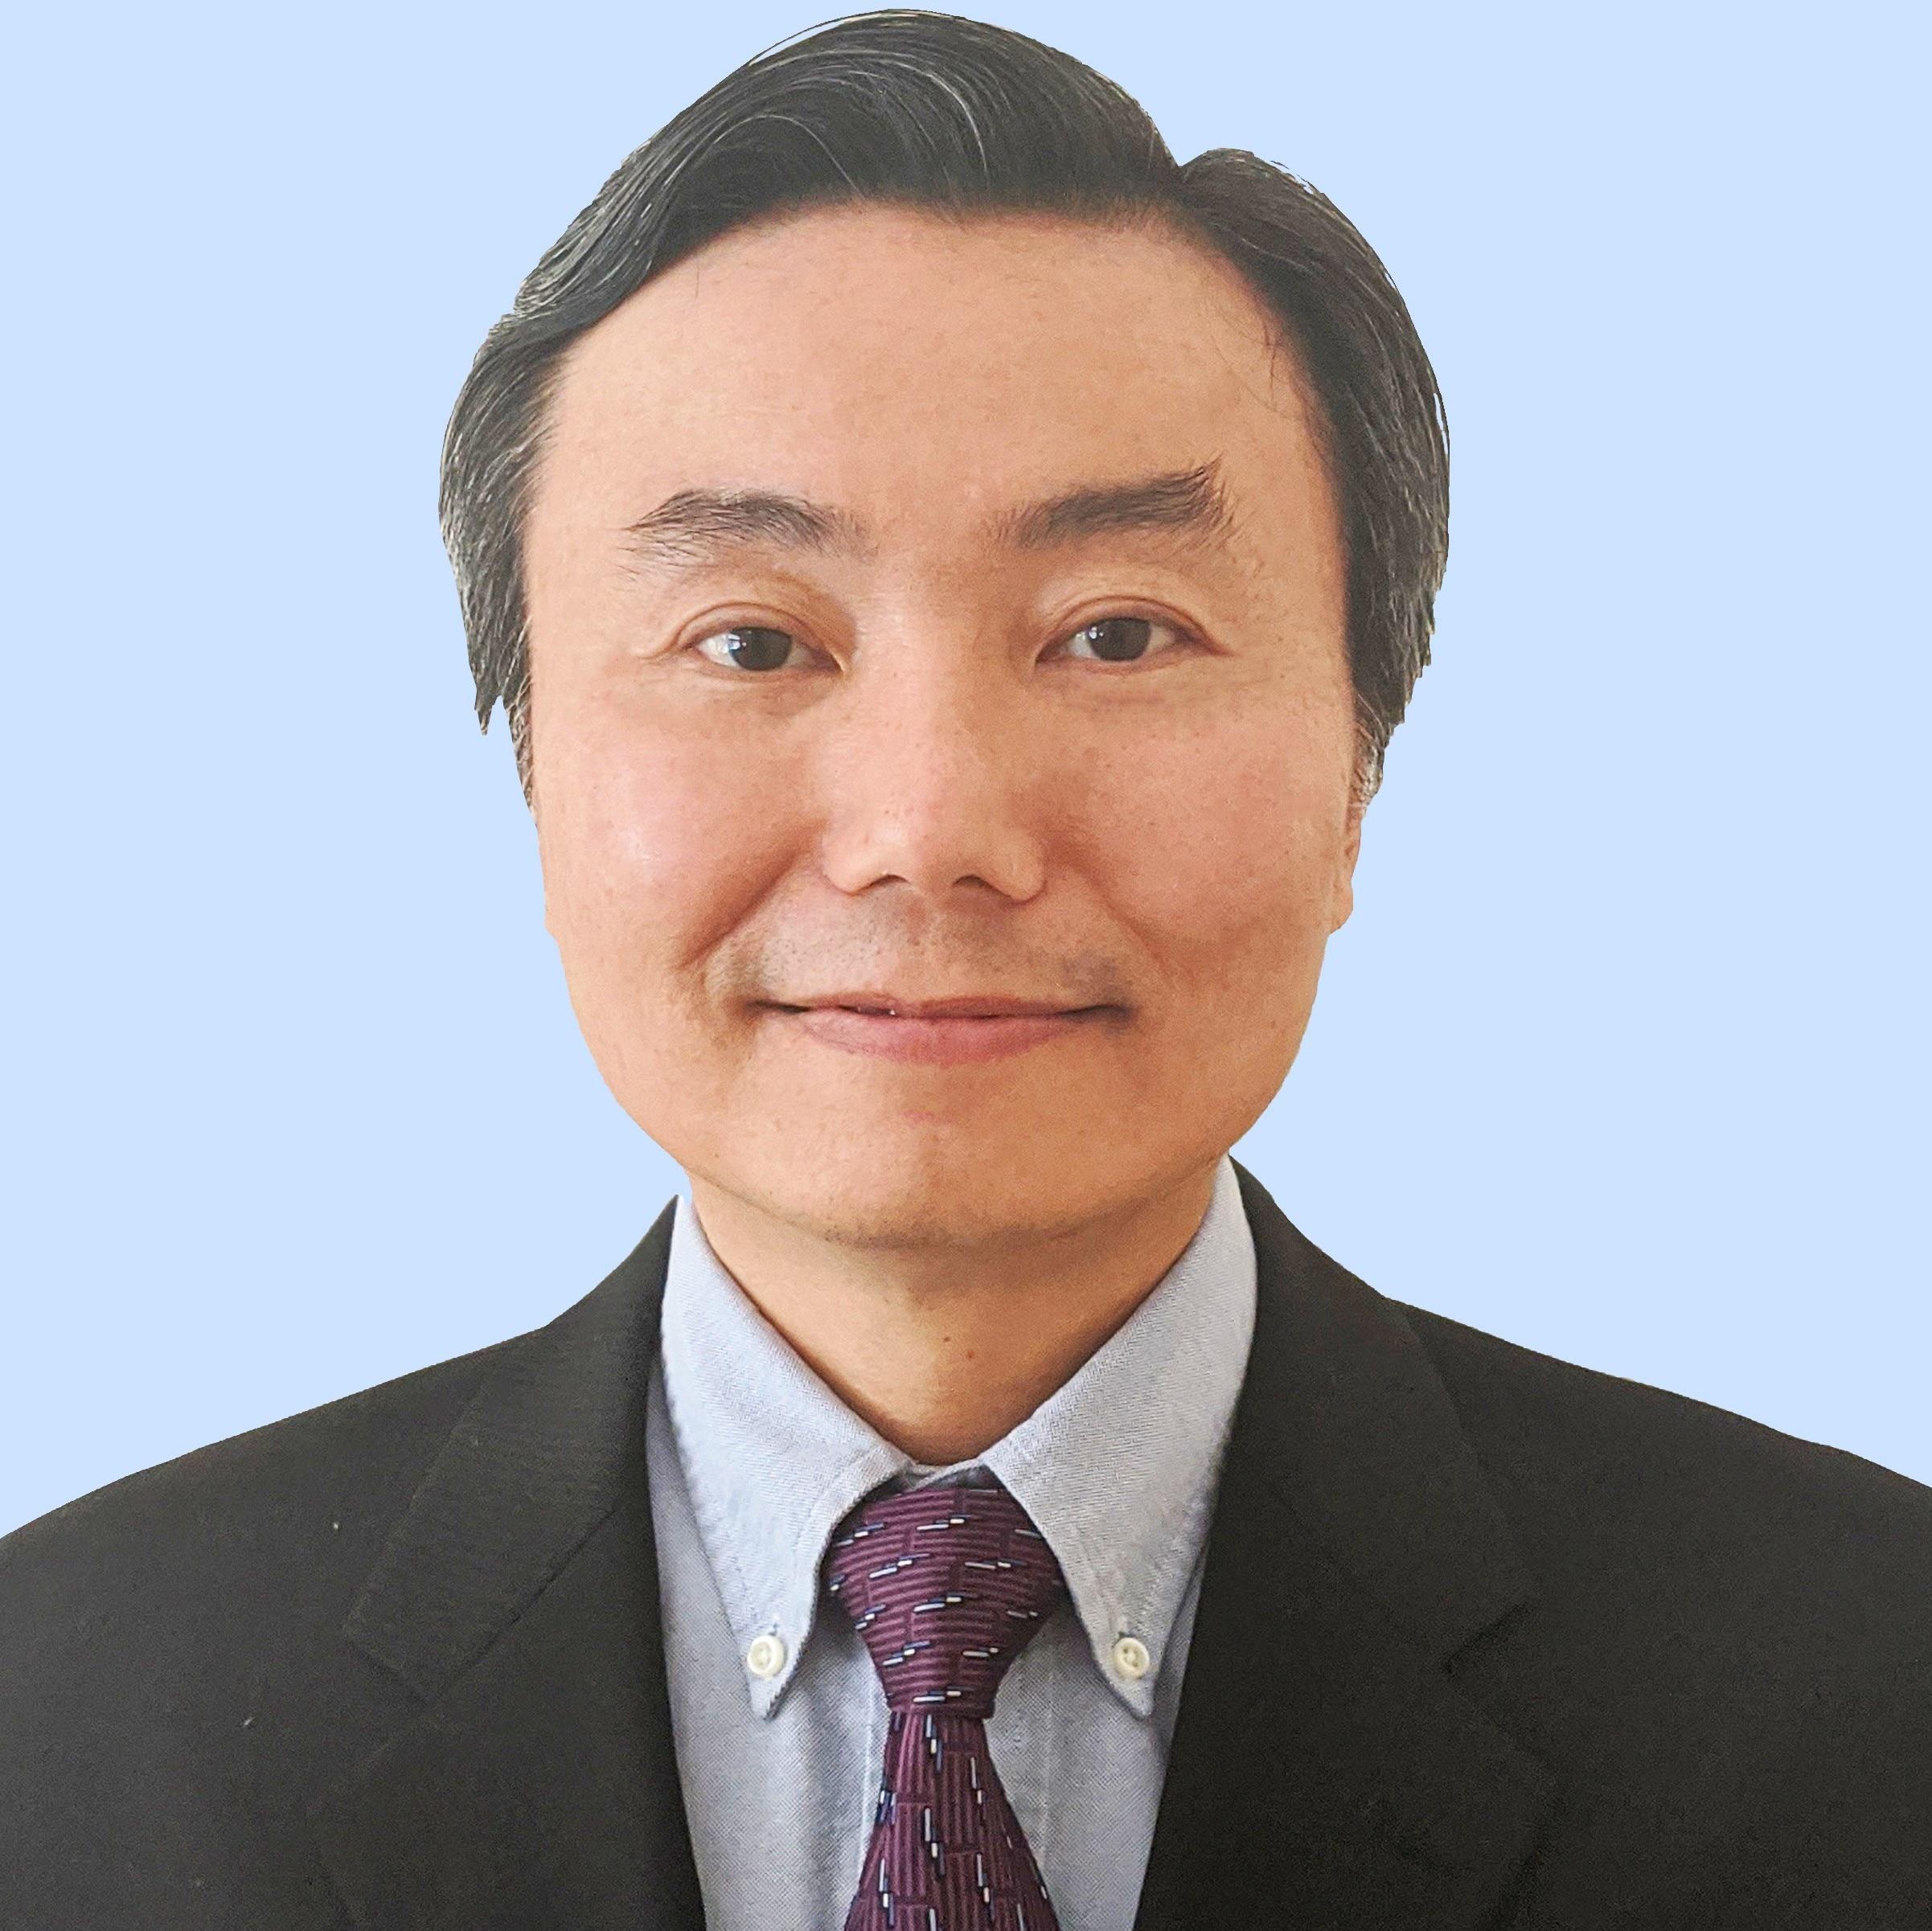 DANIEL HING-FAI FUNG  Your Registered Representative & Insurance Agent